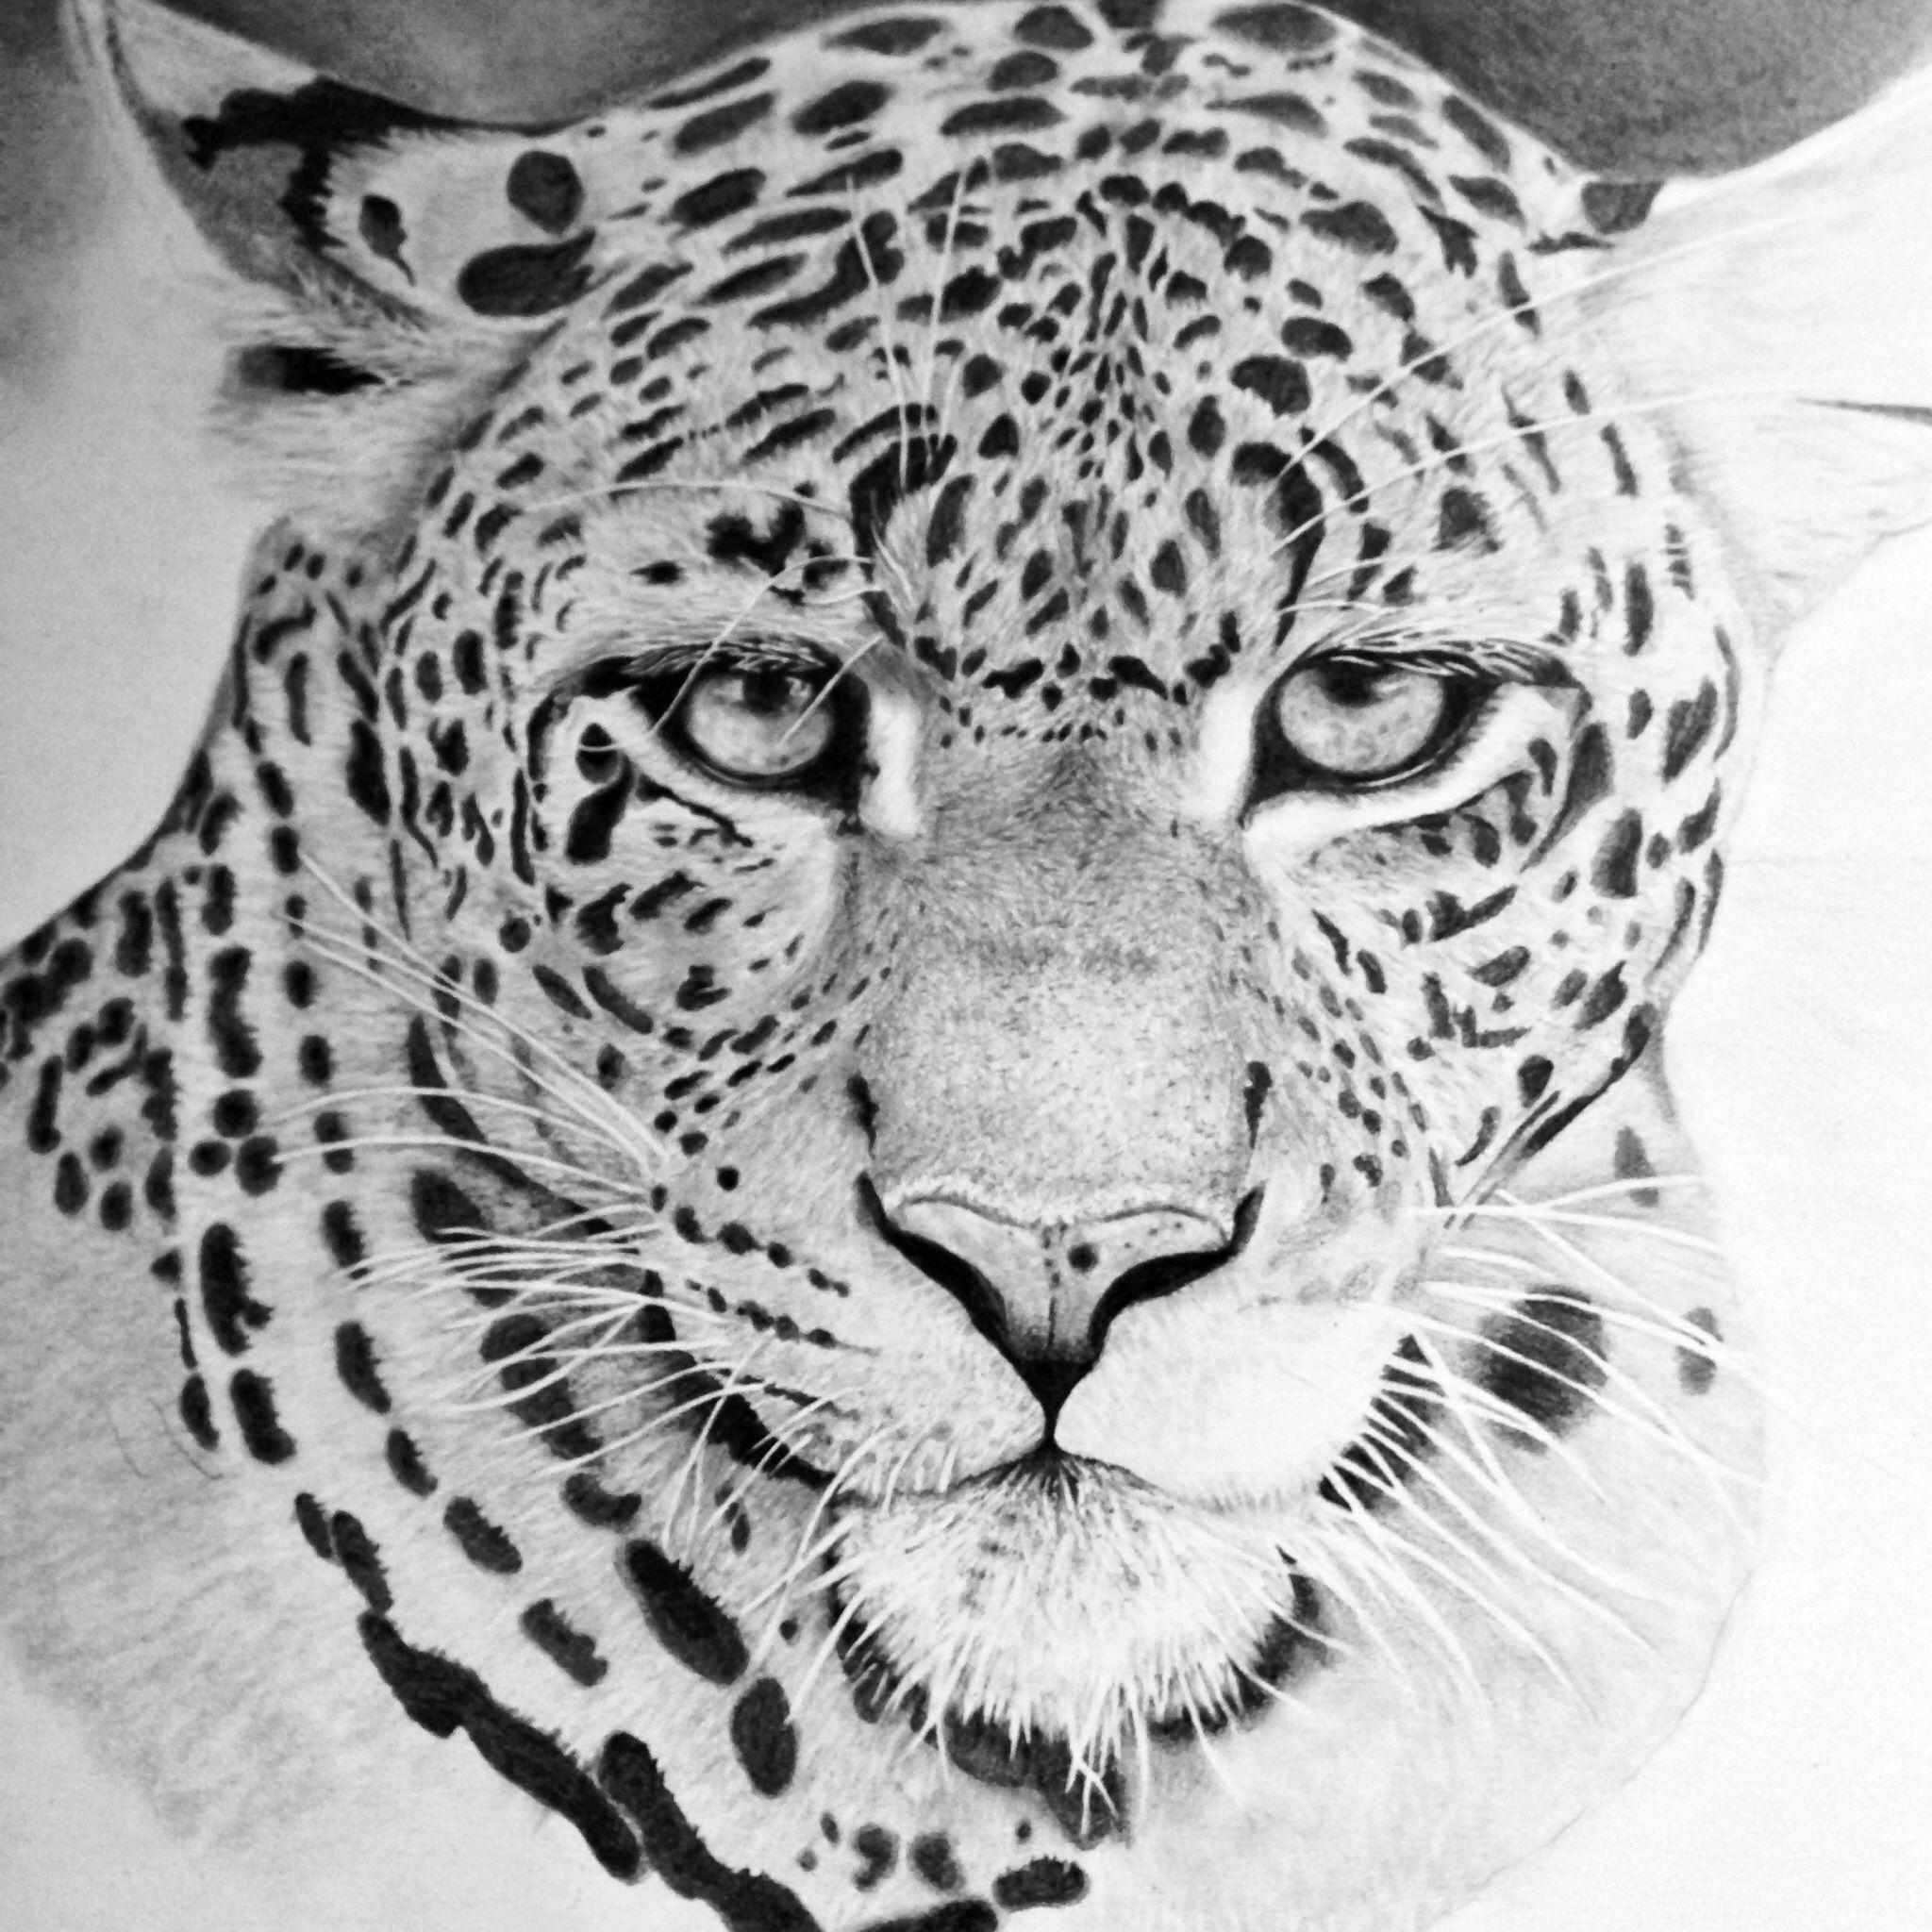 Hyper Realistic Animal Drawing by gallerydeceylon on ...